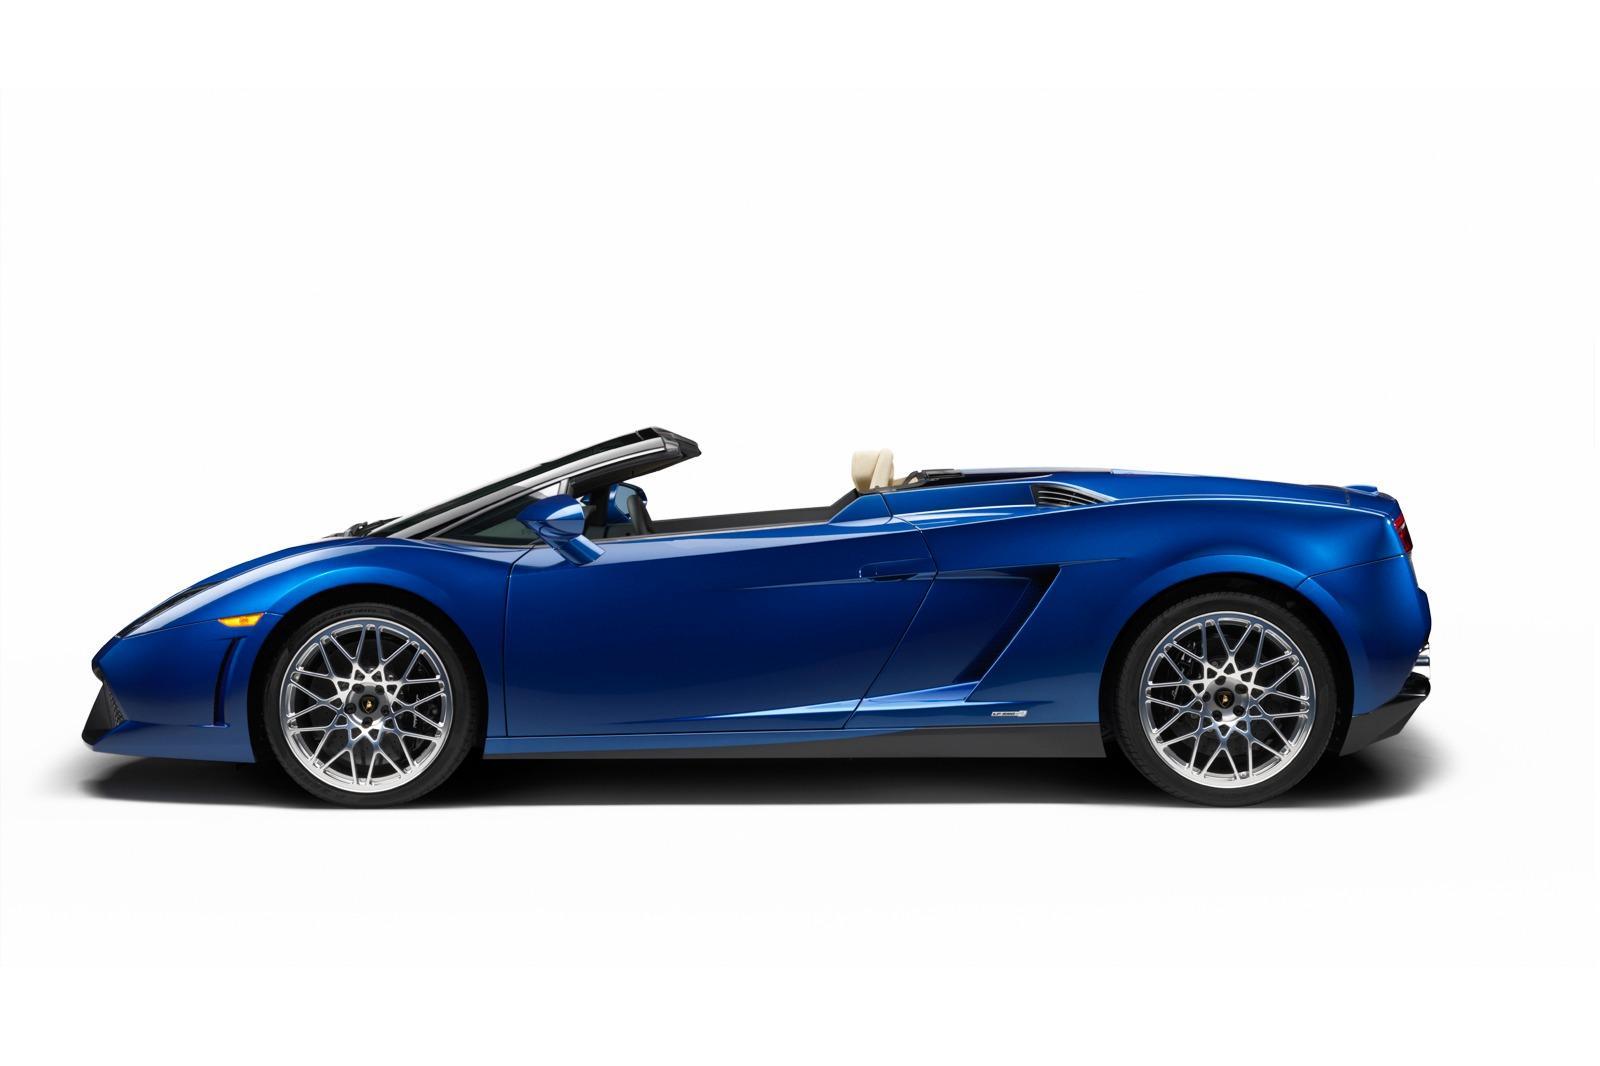 2012 Lamborghini Gallardo LP550-2 Spyder - фотография №3